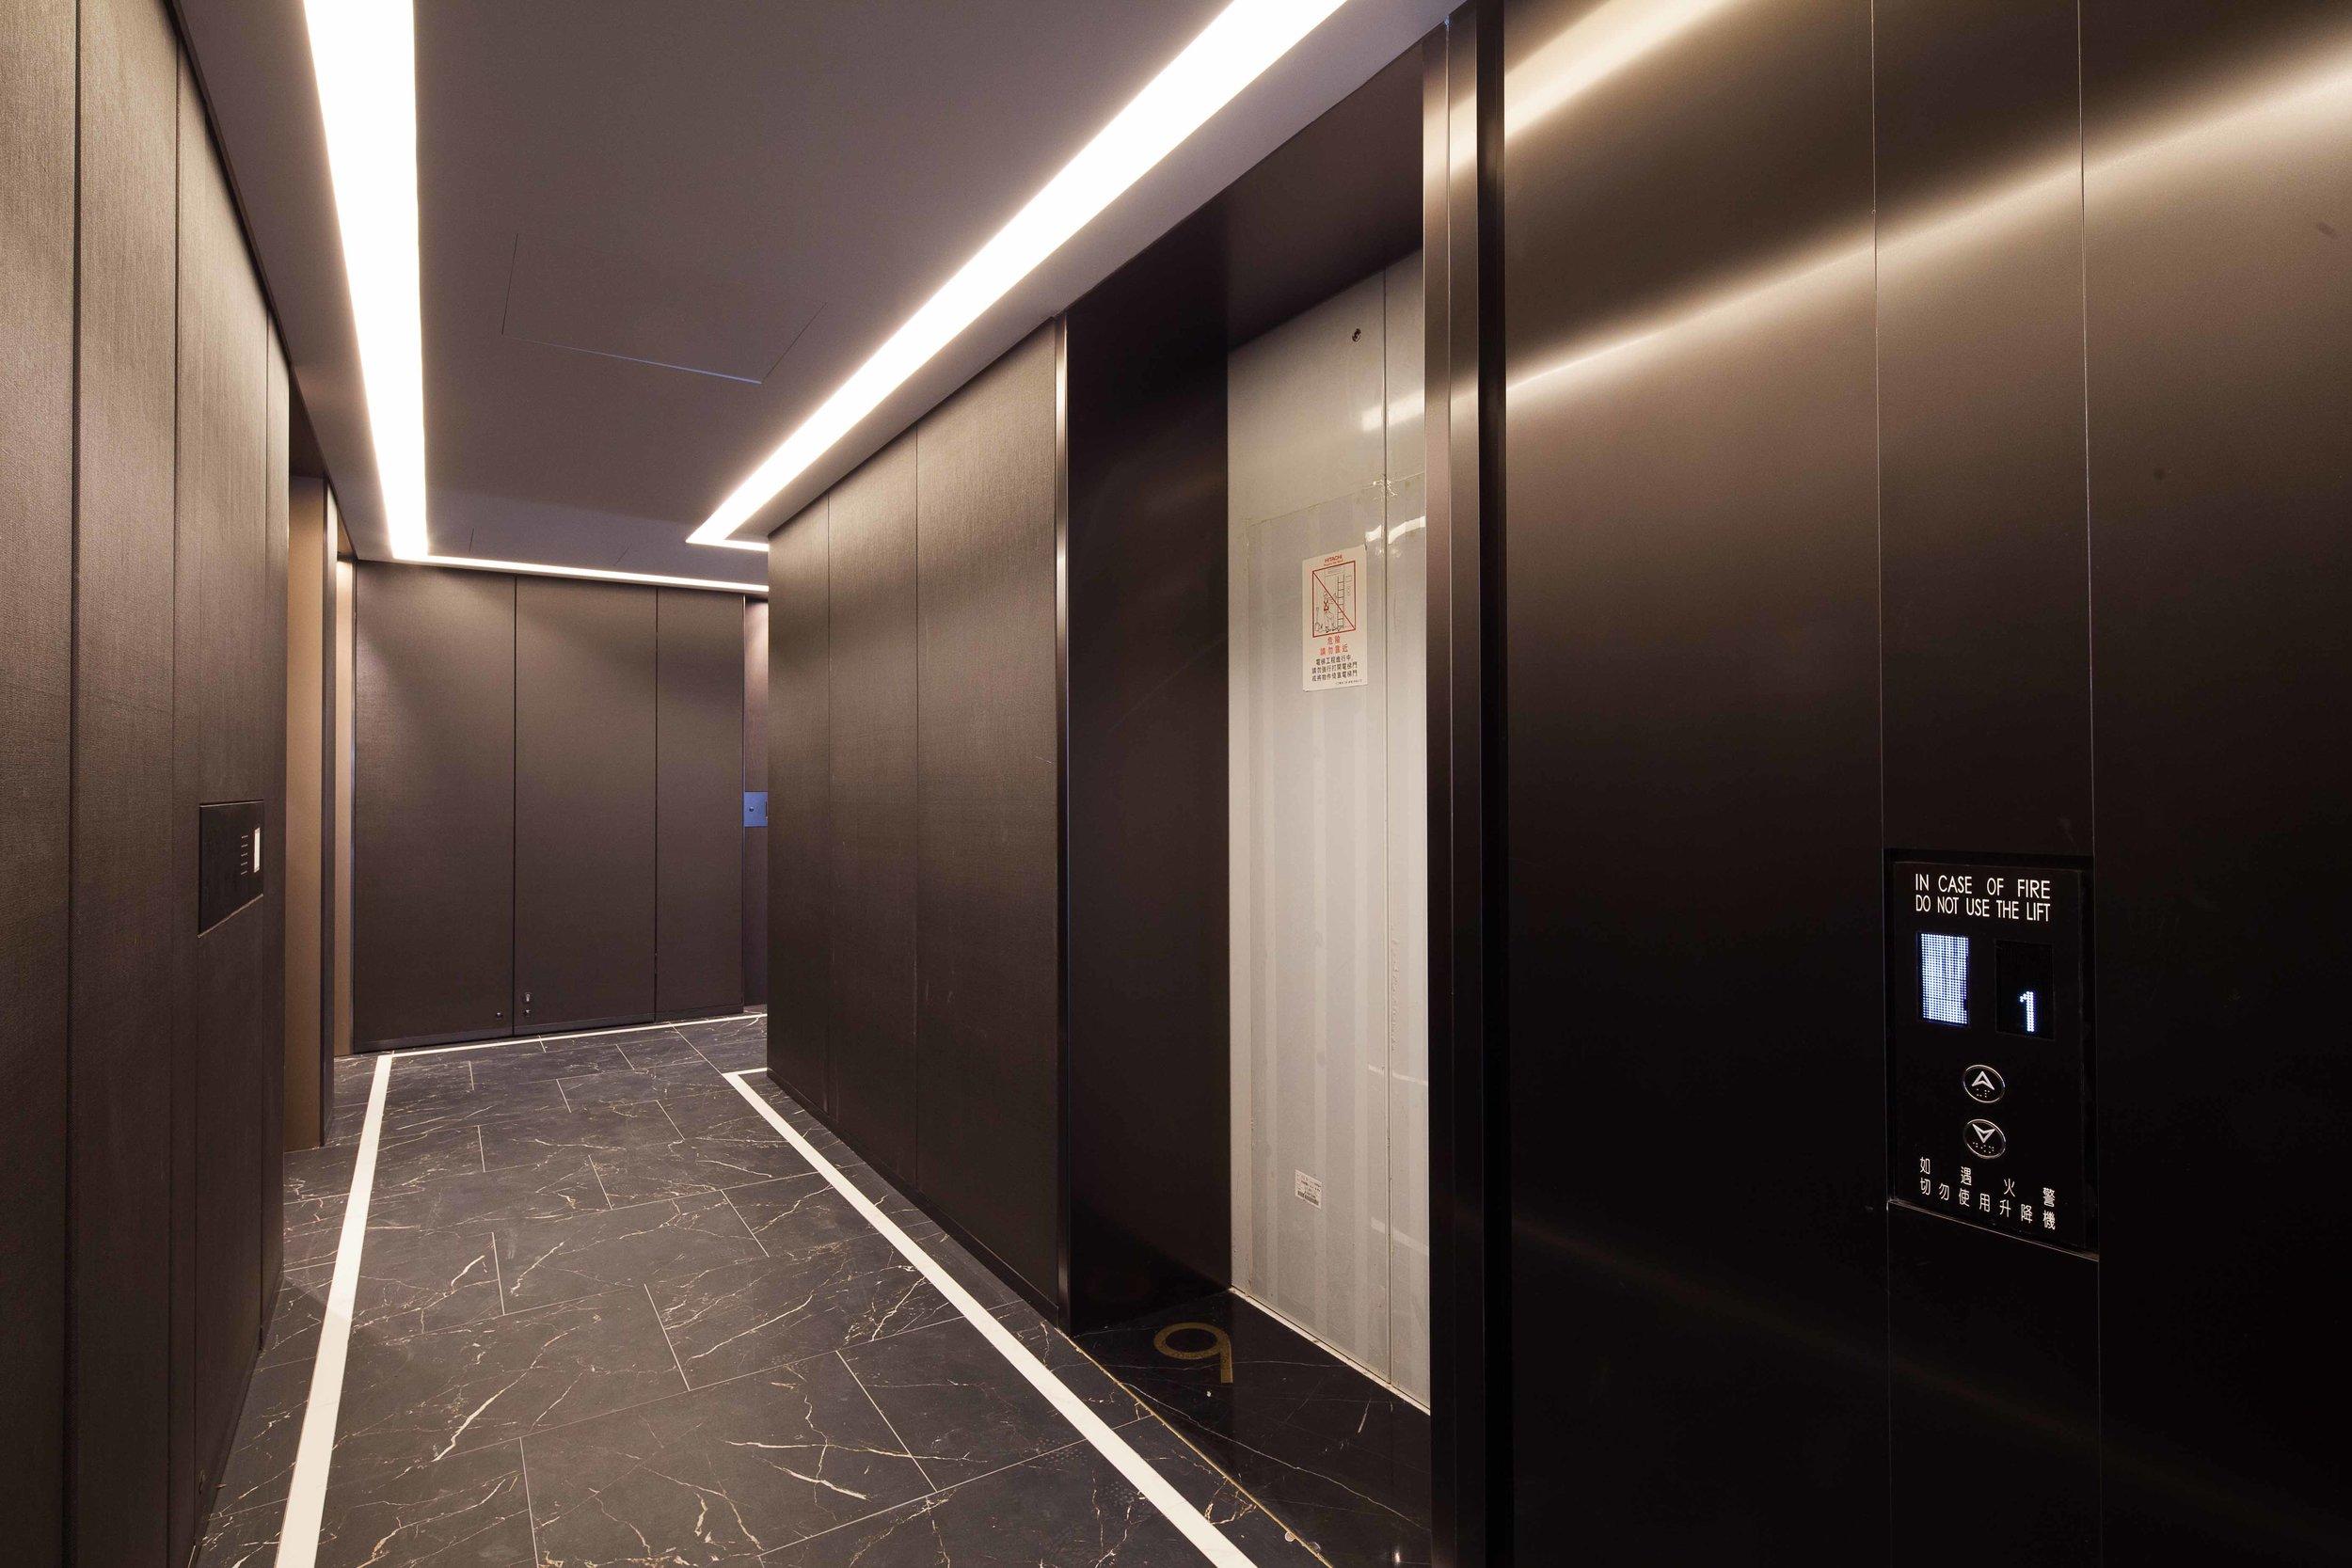 Anahita Chouhan Architecture Wanchai-Interior-JM-0015 smaller.jpg